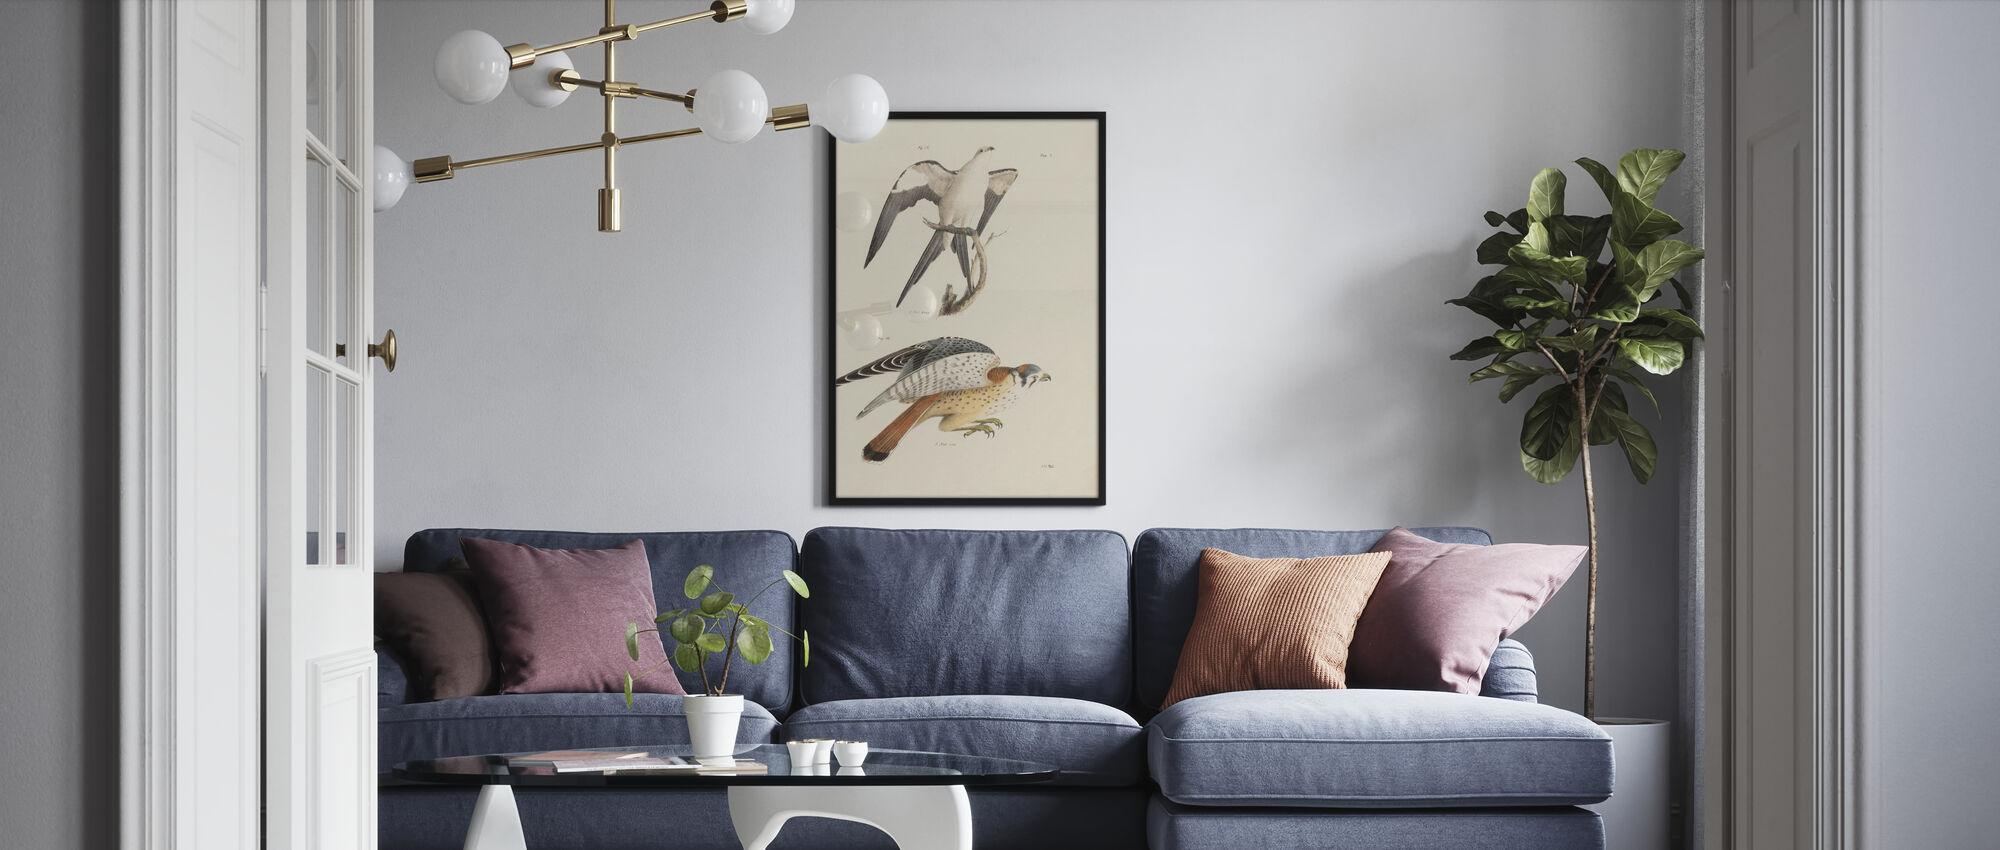 Birds of Prey I - Poster - Living Room